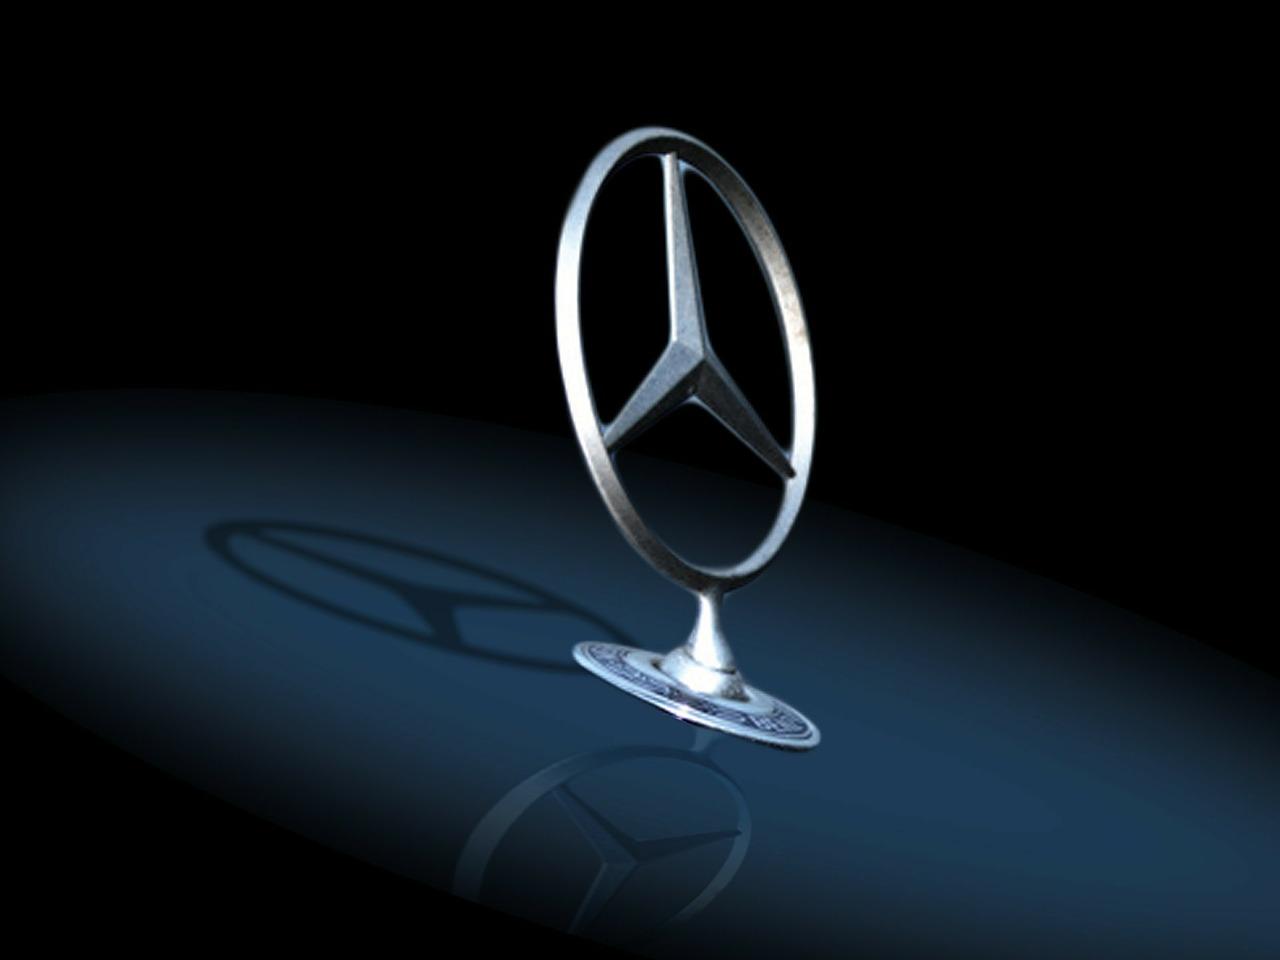 Mercedes Benz Logo Elegant Wallpaper Galleryautomo 1280x960